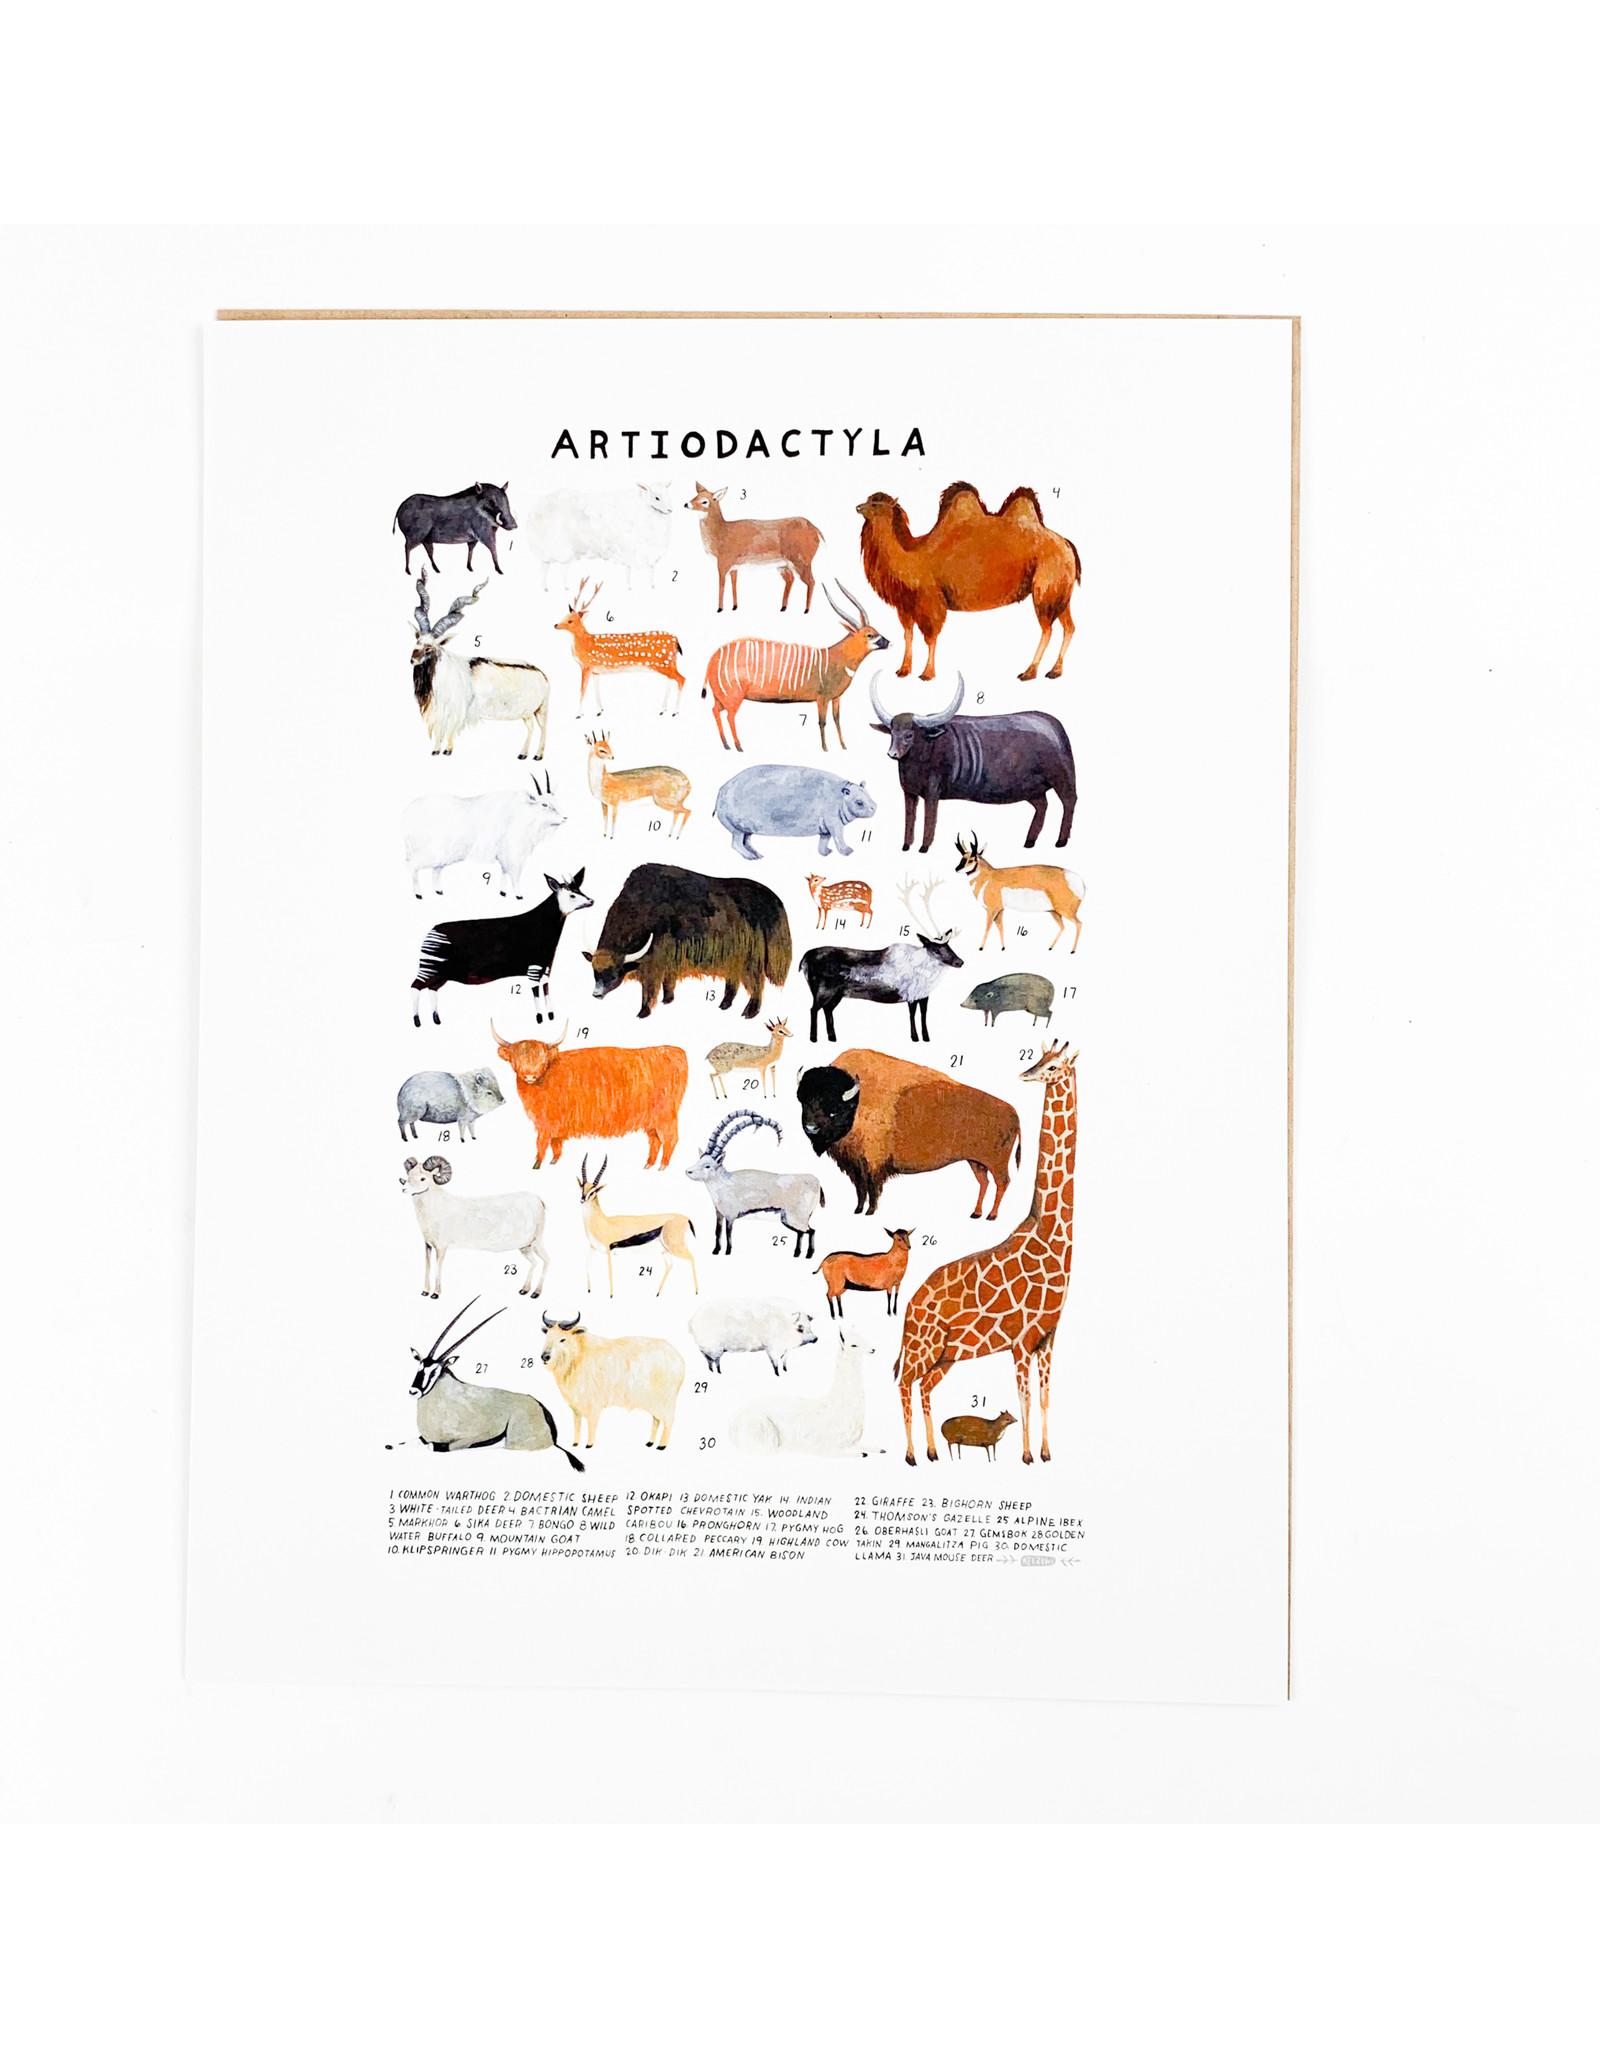 Kelzuki/Consignment Mini Print Consignment - Artiodactyla